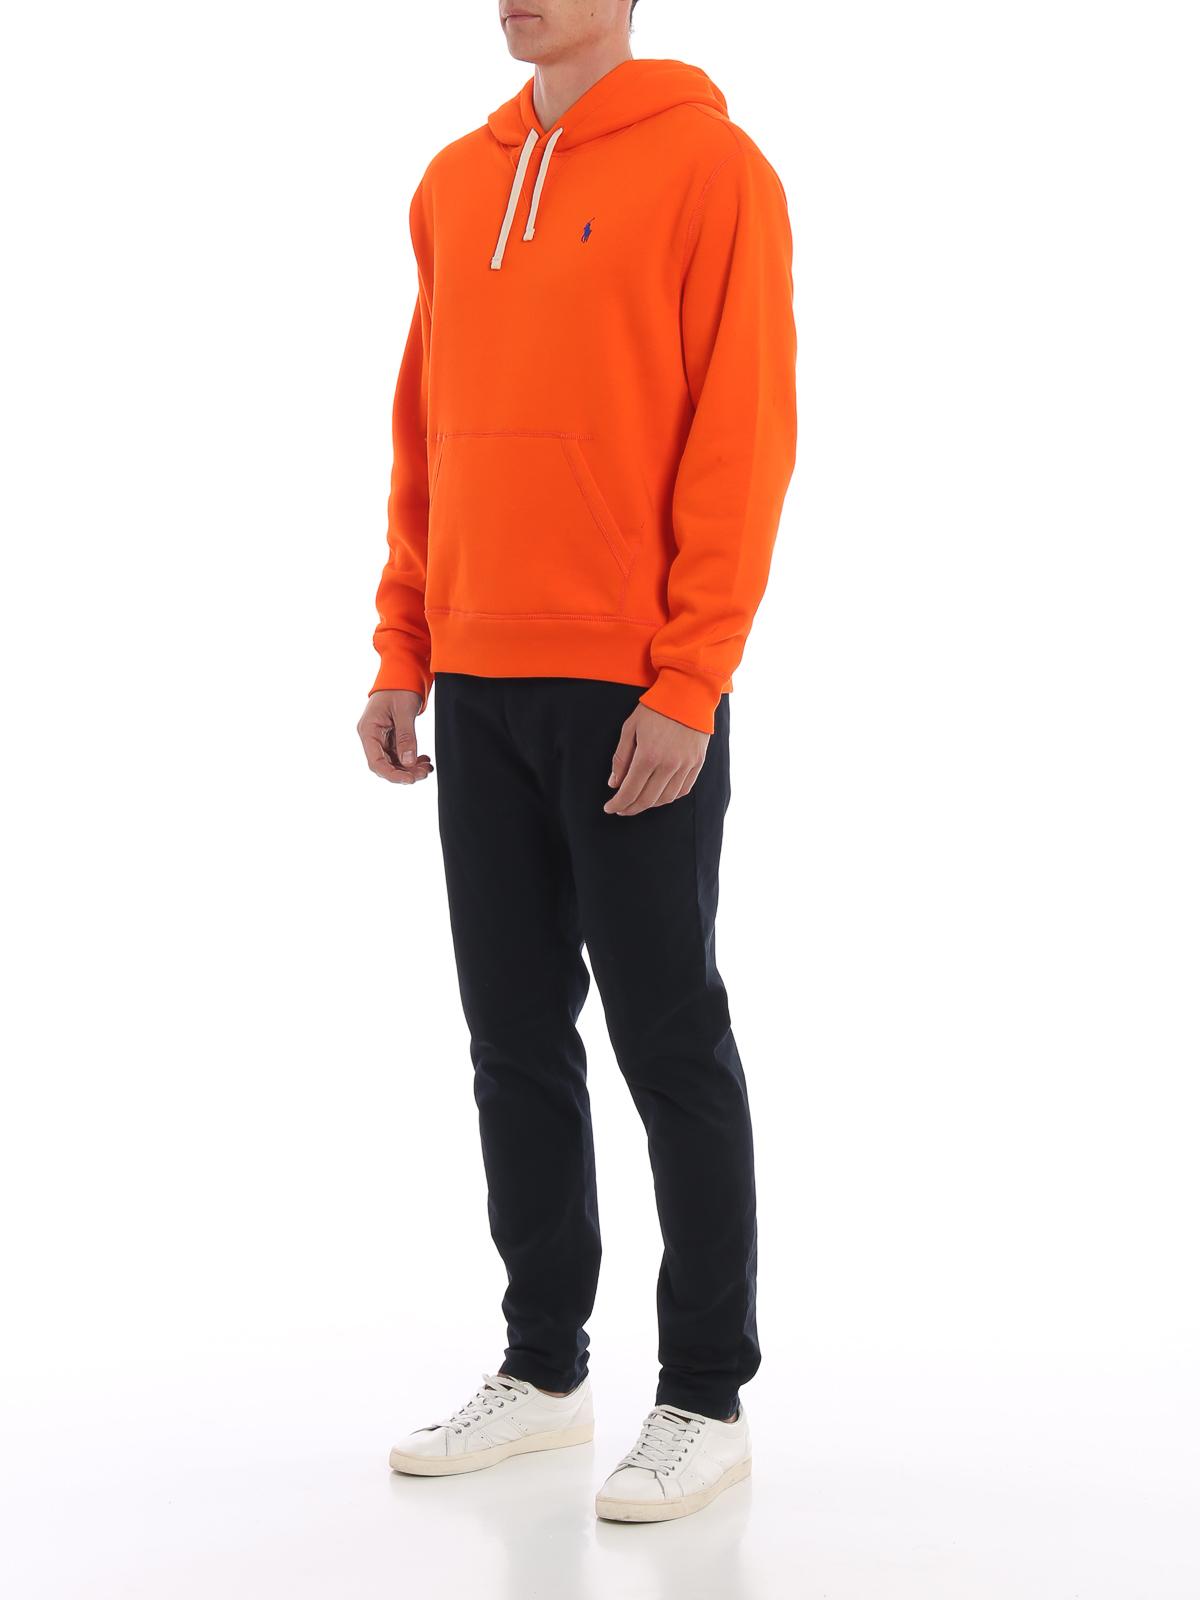 Ralph Polo Orange Lauren Hoodie Cotton Blend Sweatshirts LMVpqGSUz